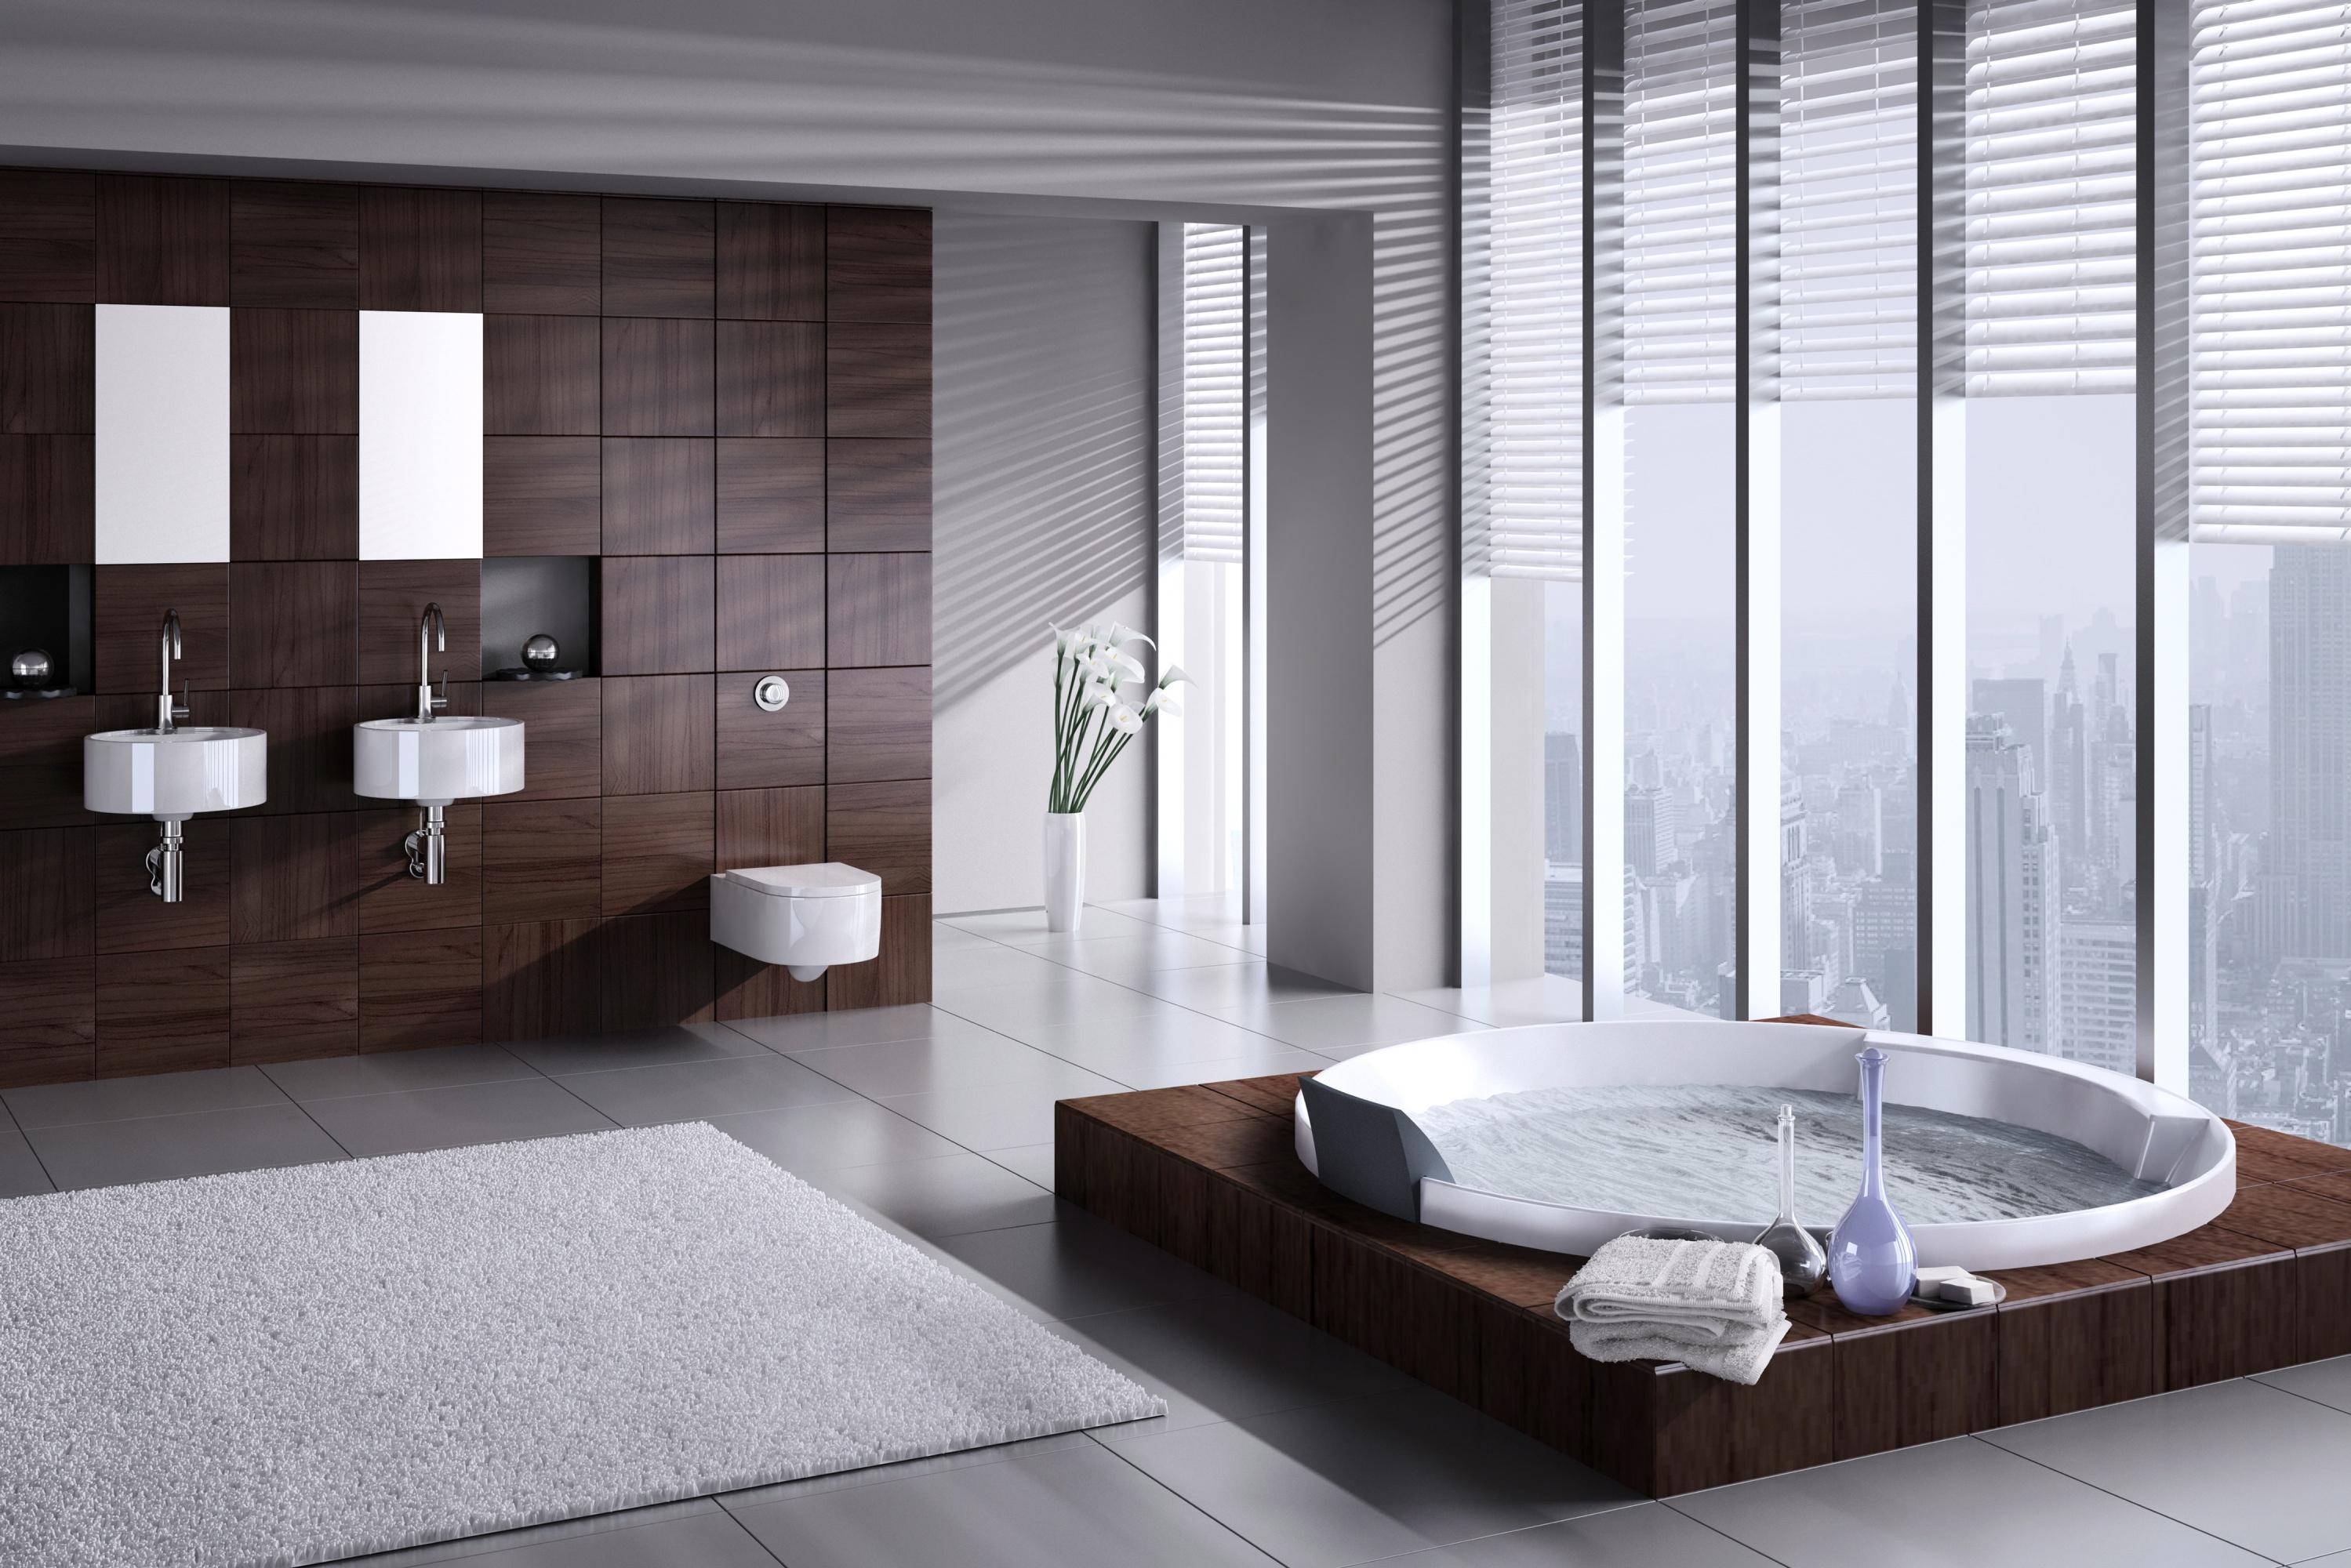 Tonnema installatie badkamer